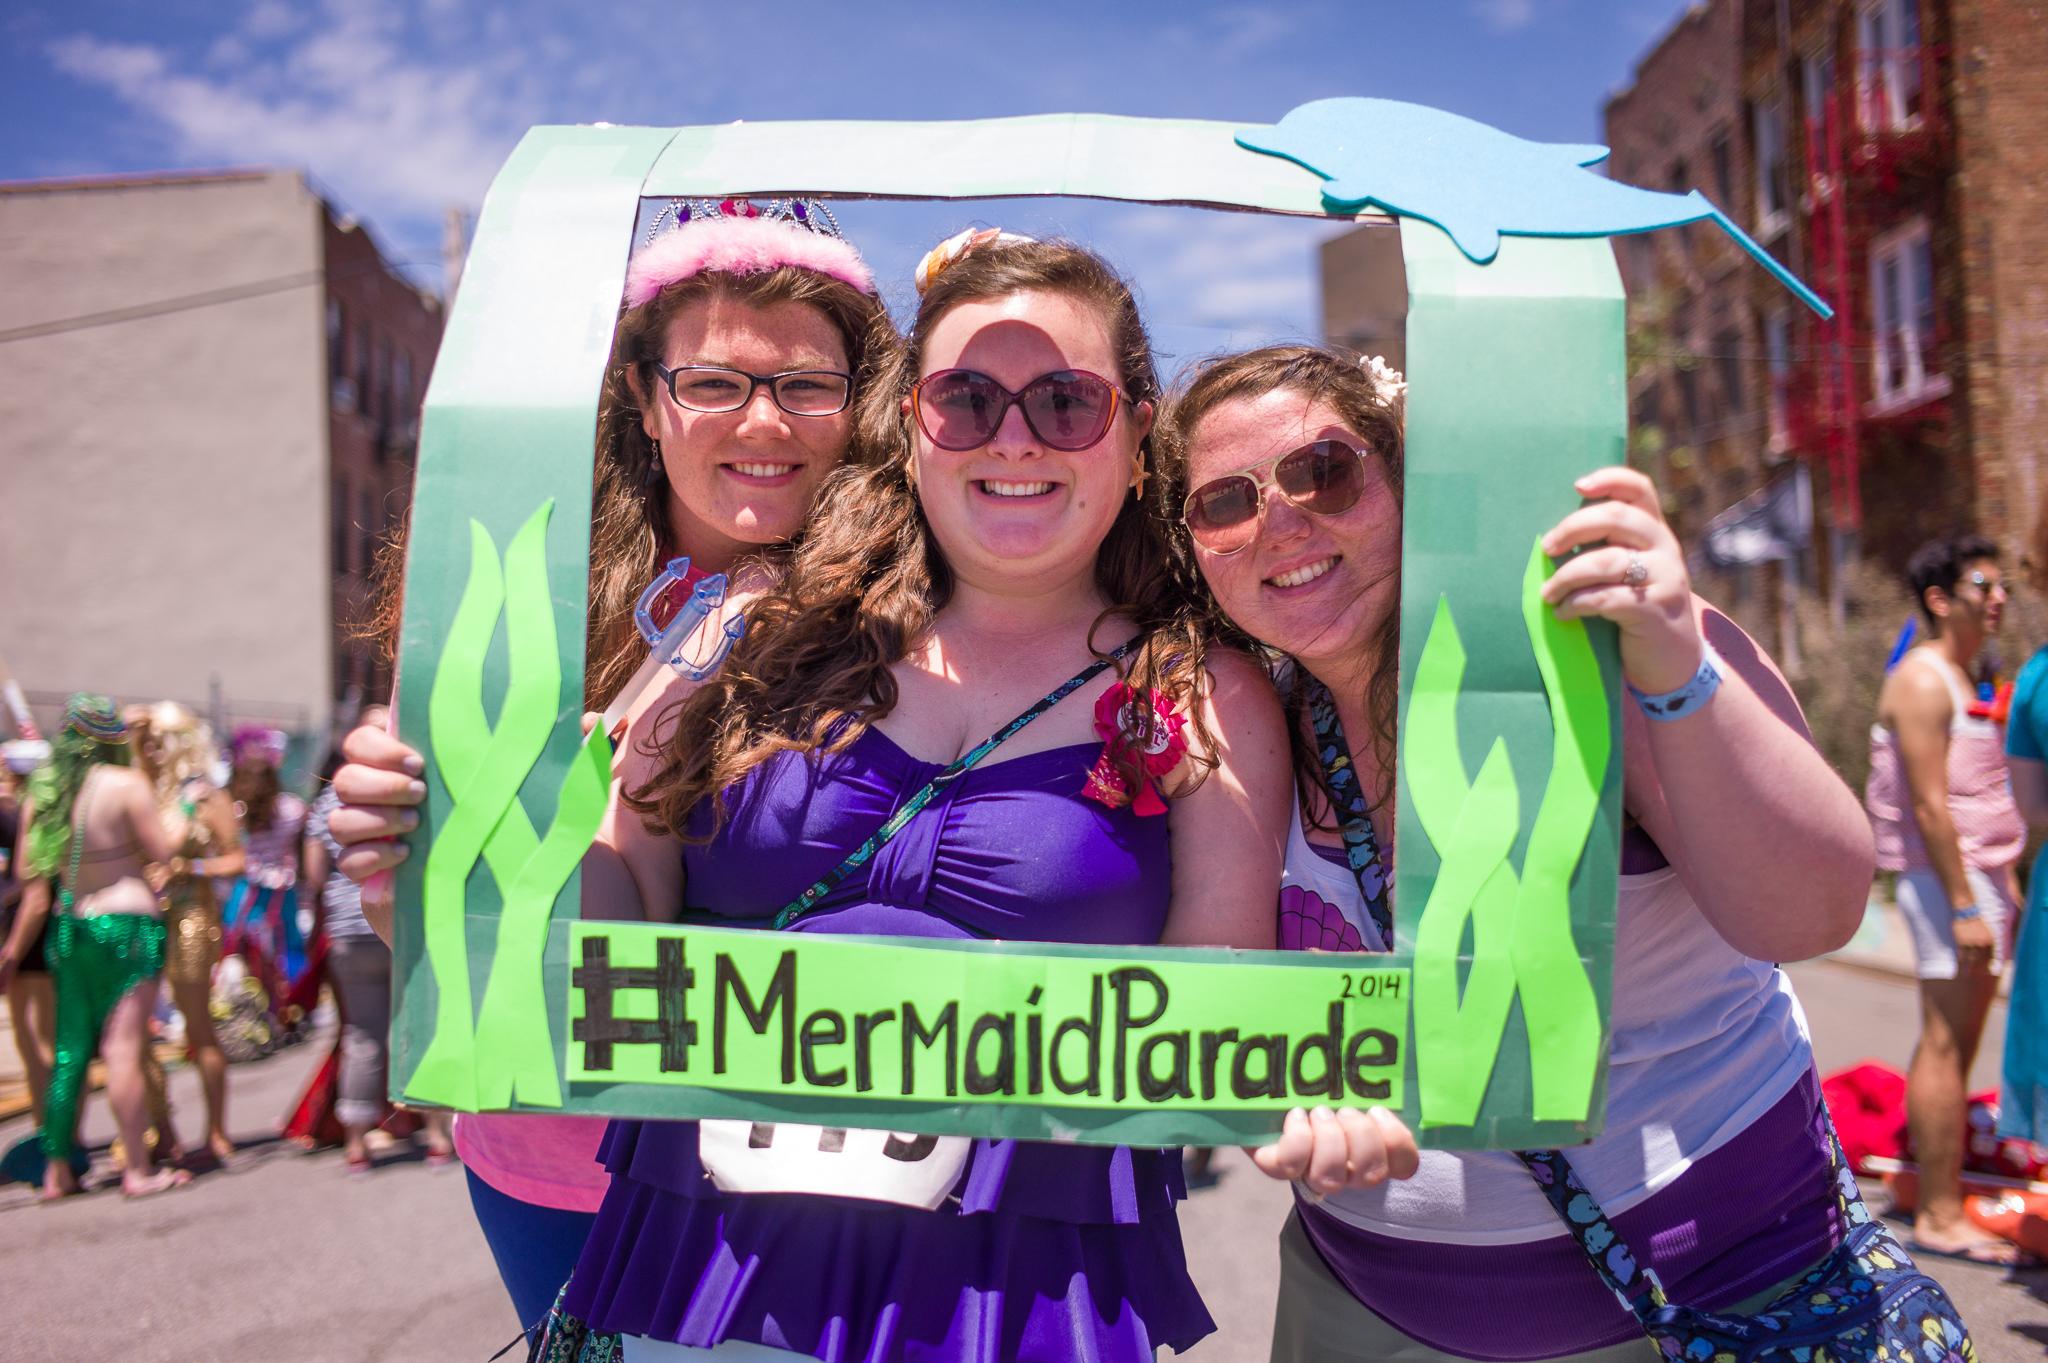 mermaid_parade_2014_009.jpg